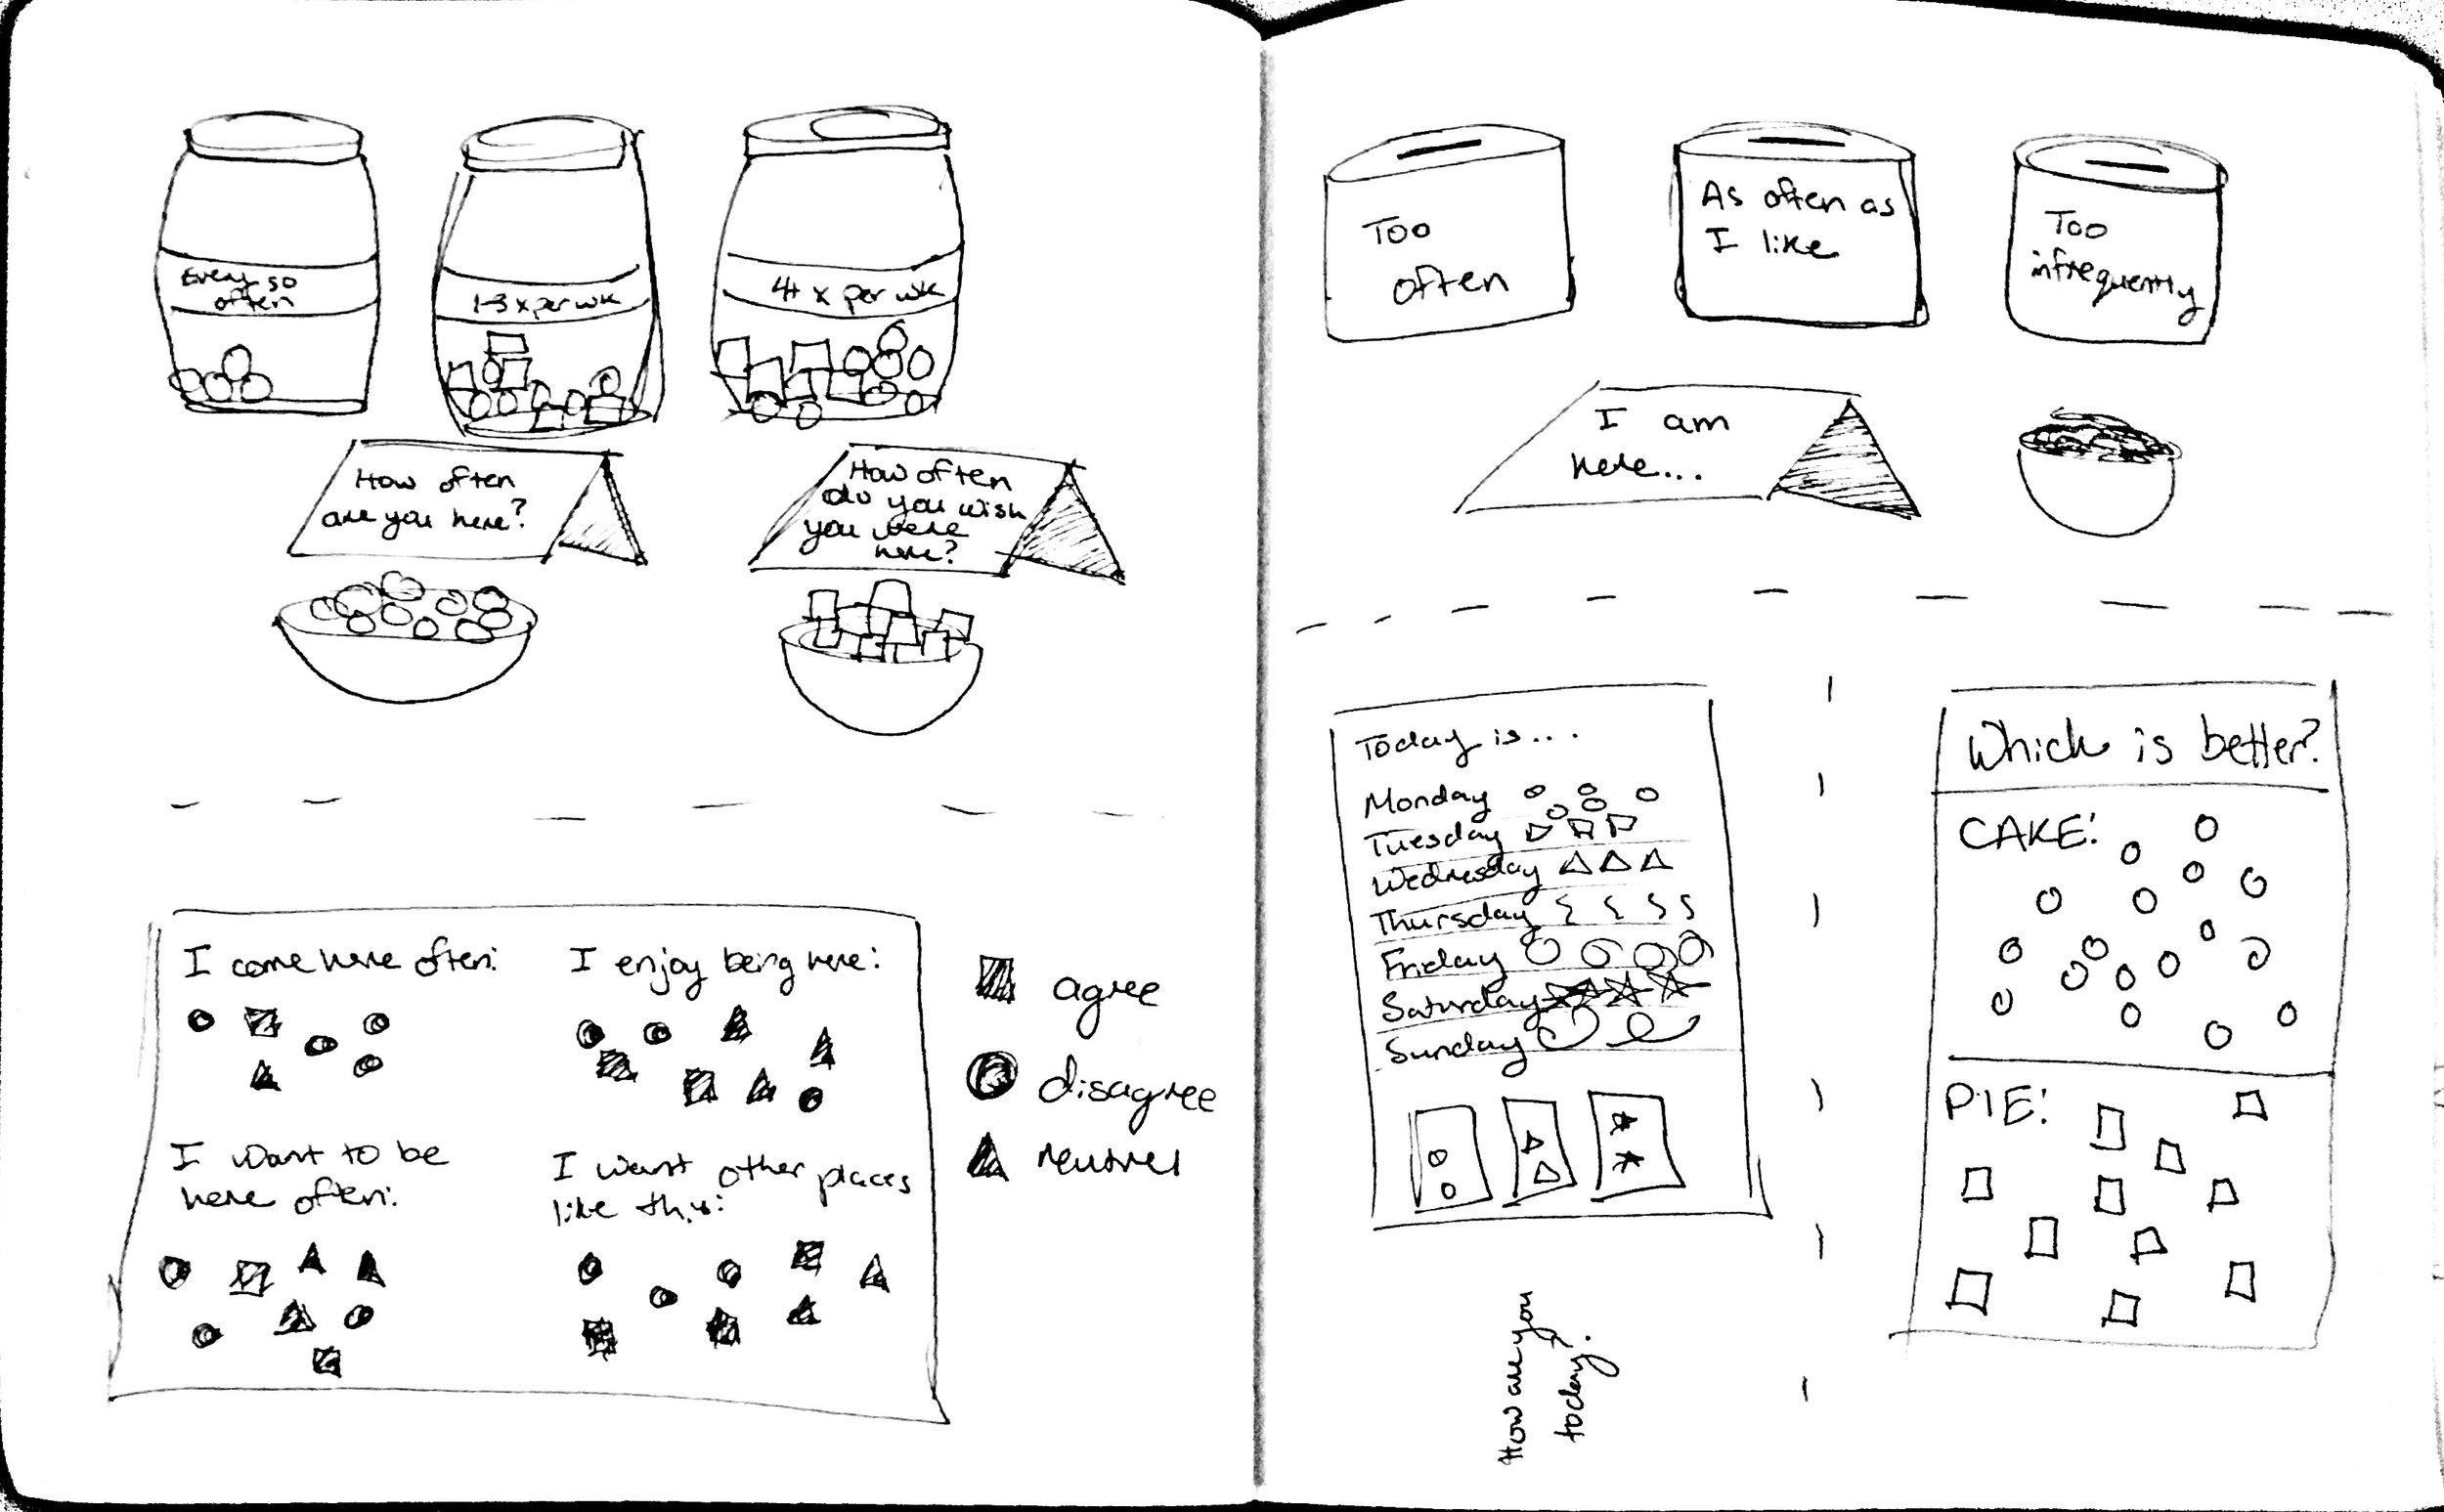 Brainstorming research methods